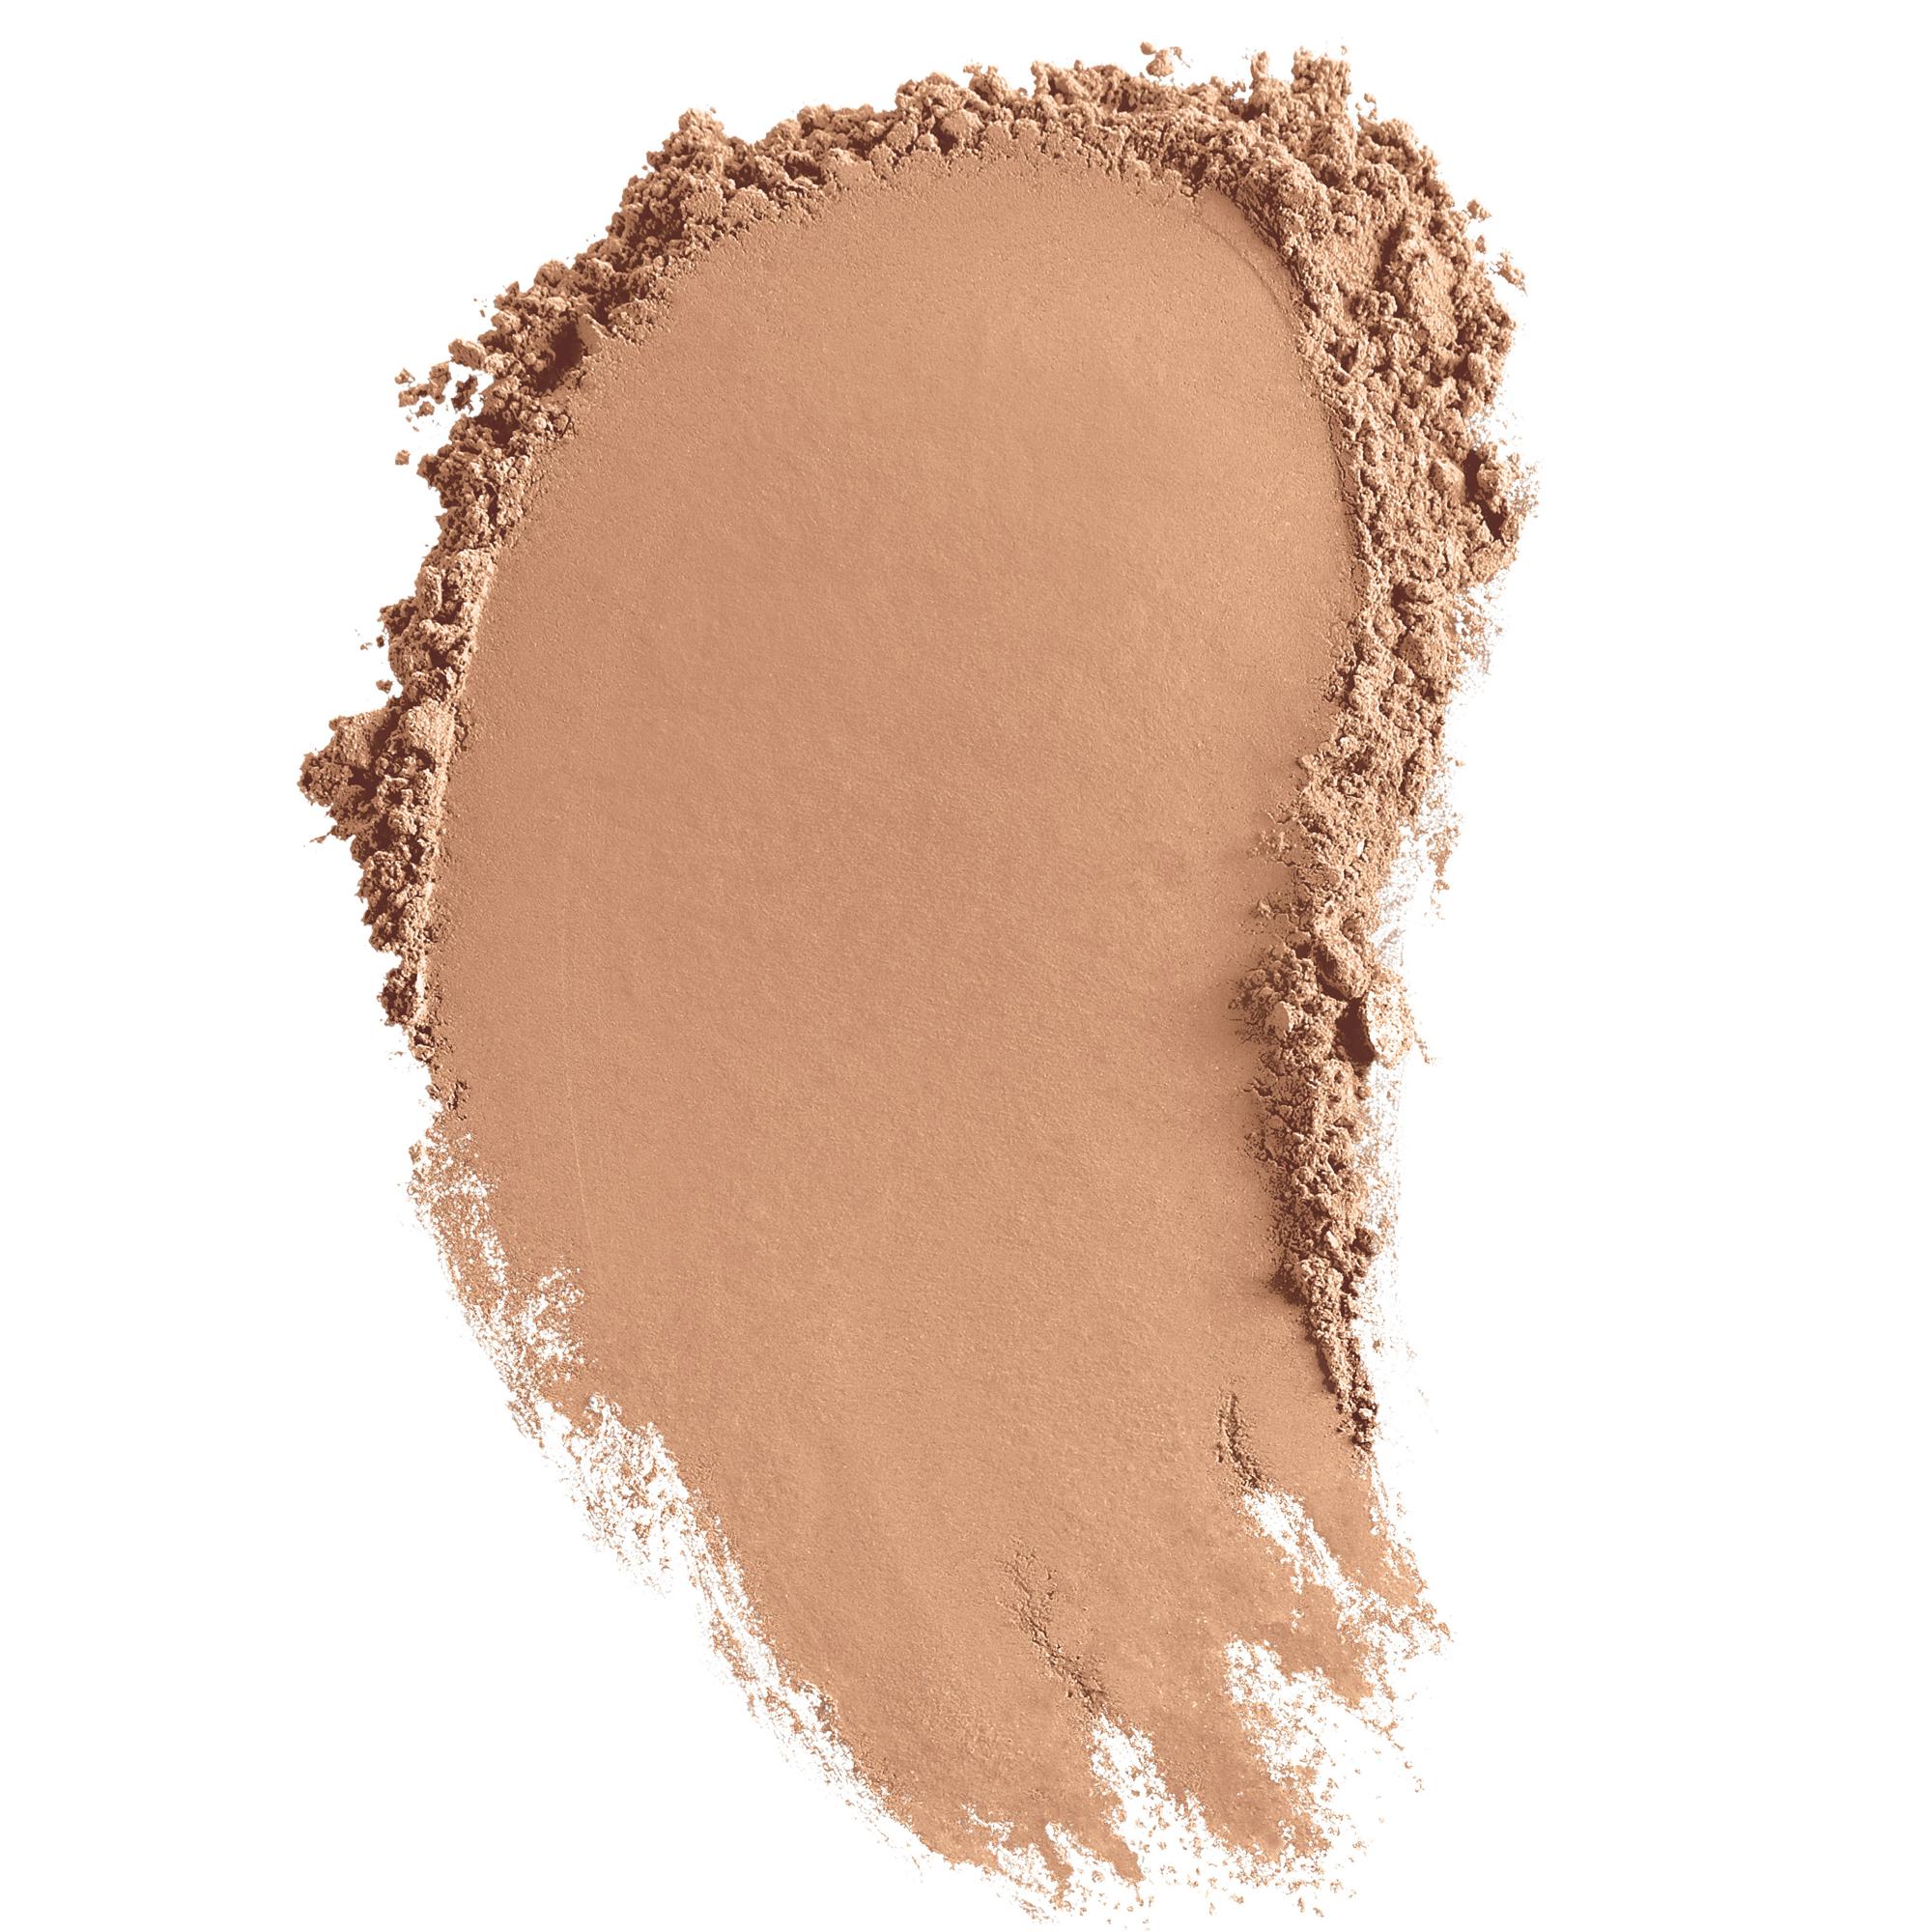 bareMinerals Original Foundation, 18 medium tan